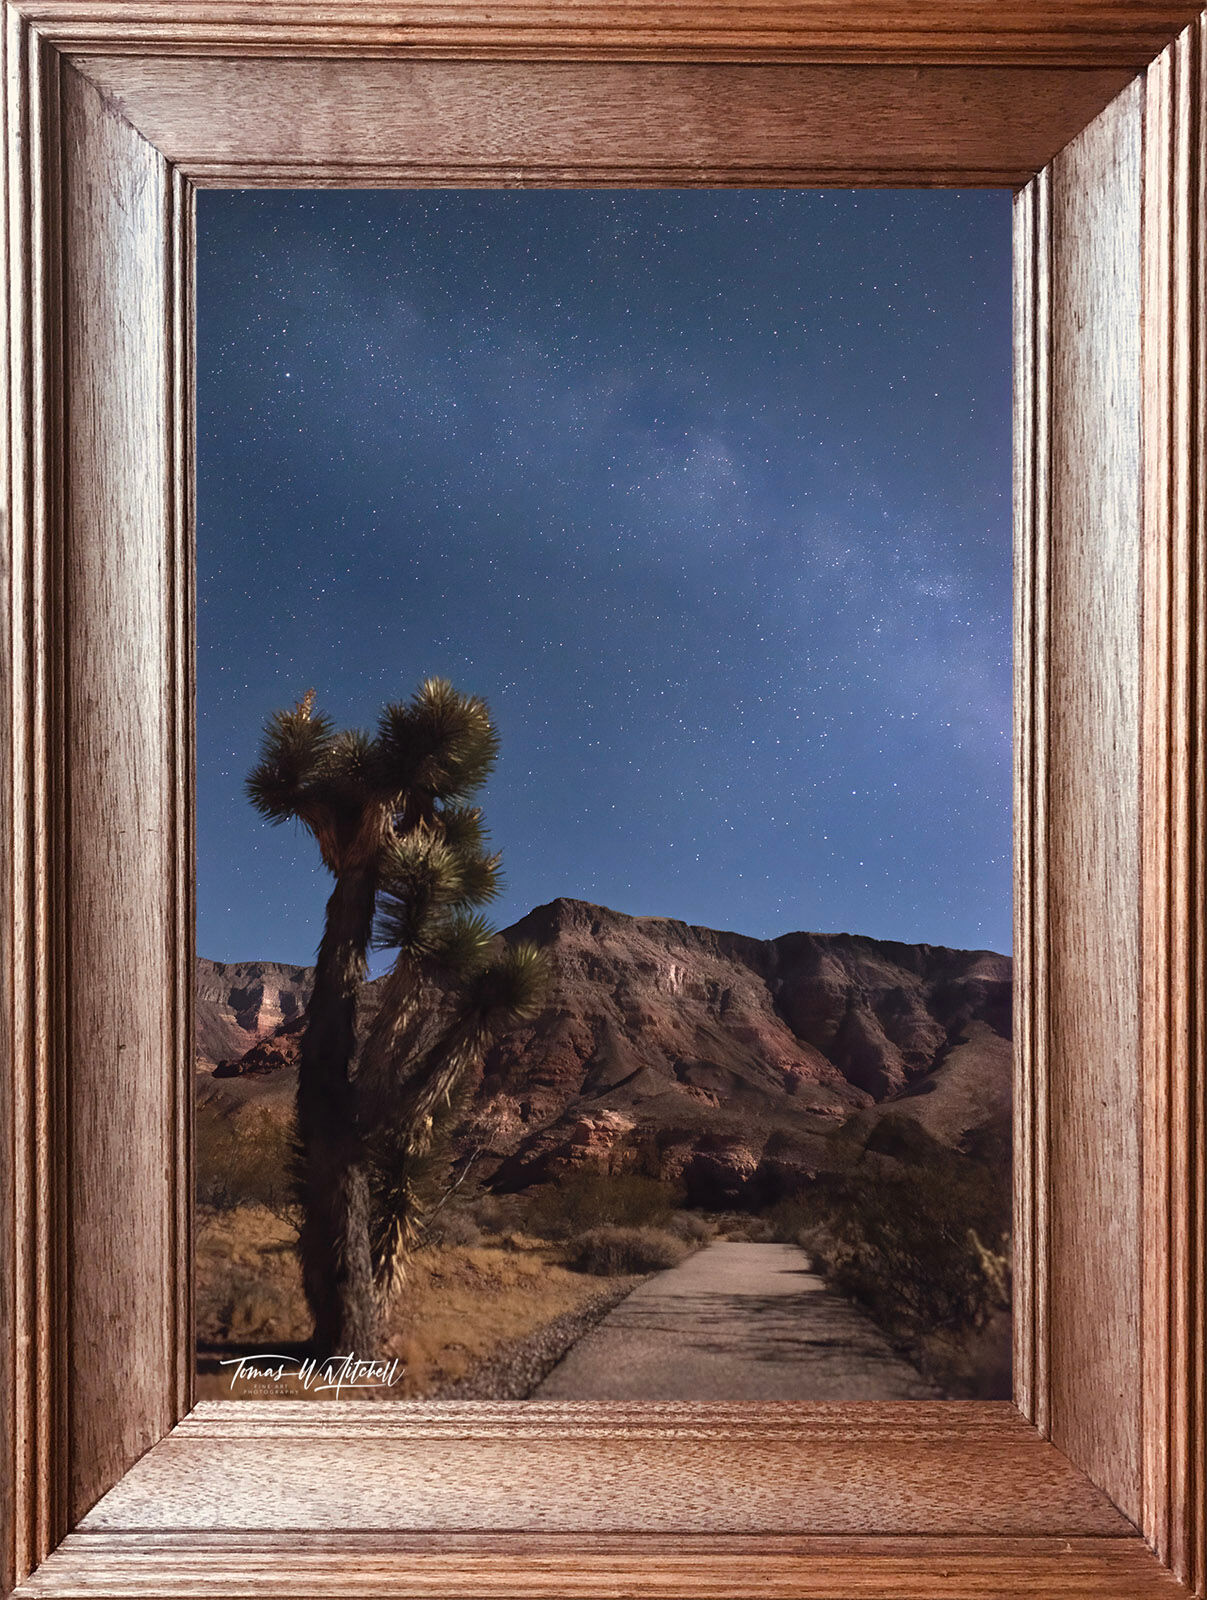 frames, open edition, frame, 20x30, print, photographs,, photo